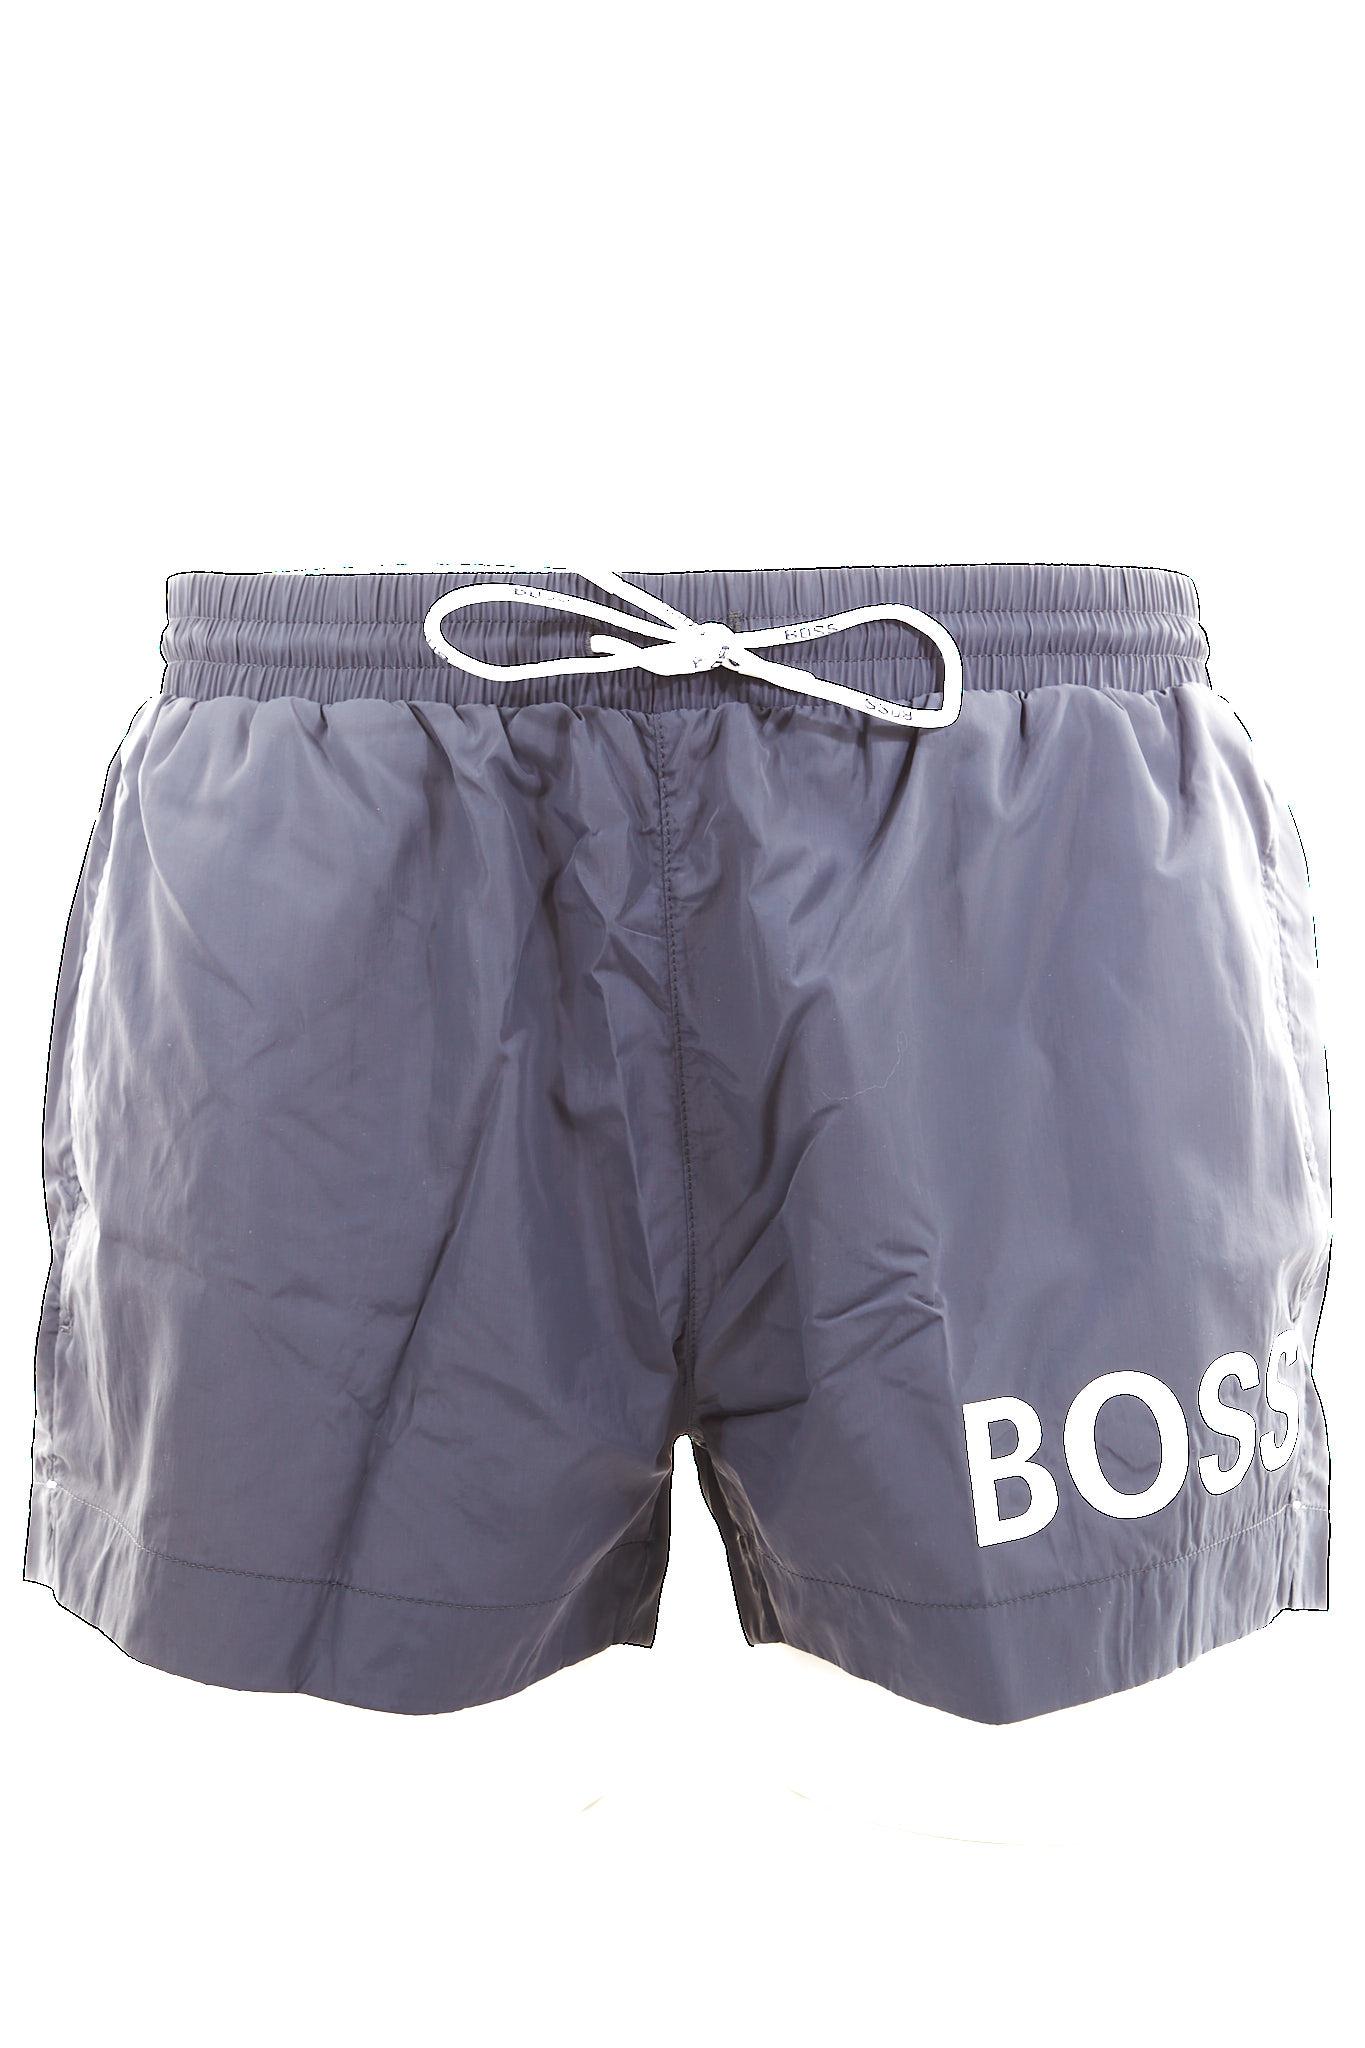 Costume a pantaloncino Mooneye BOSS | Costume | 50437378024